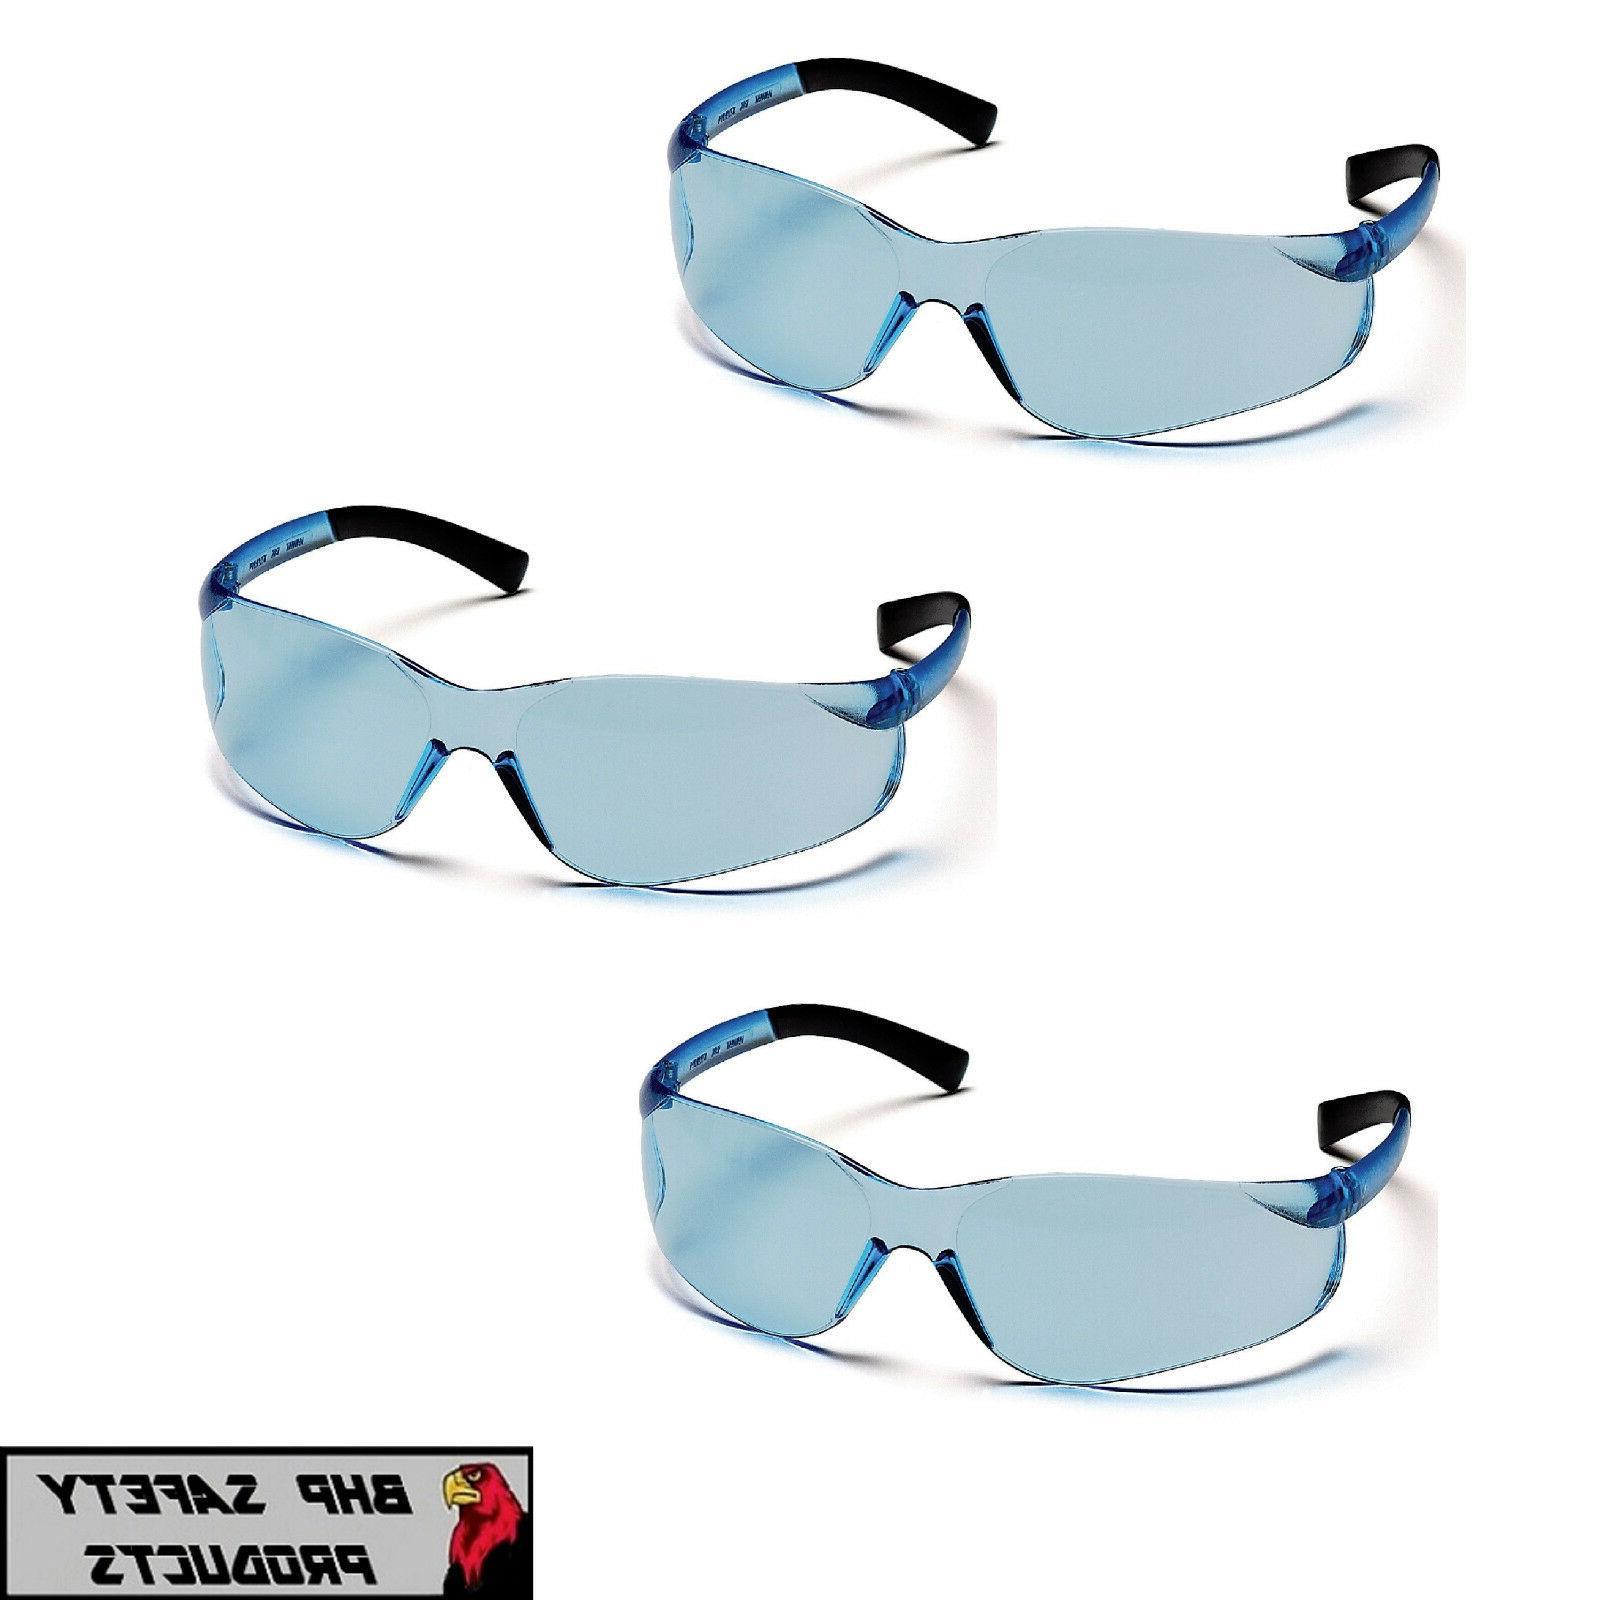 3 pr ztek safety glasses infinity blue